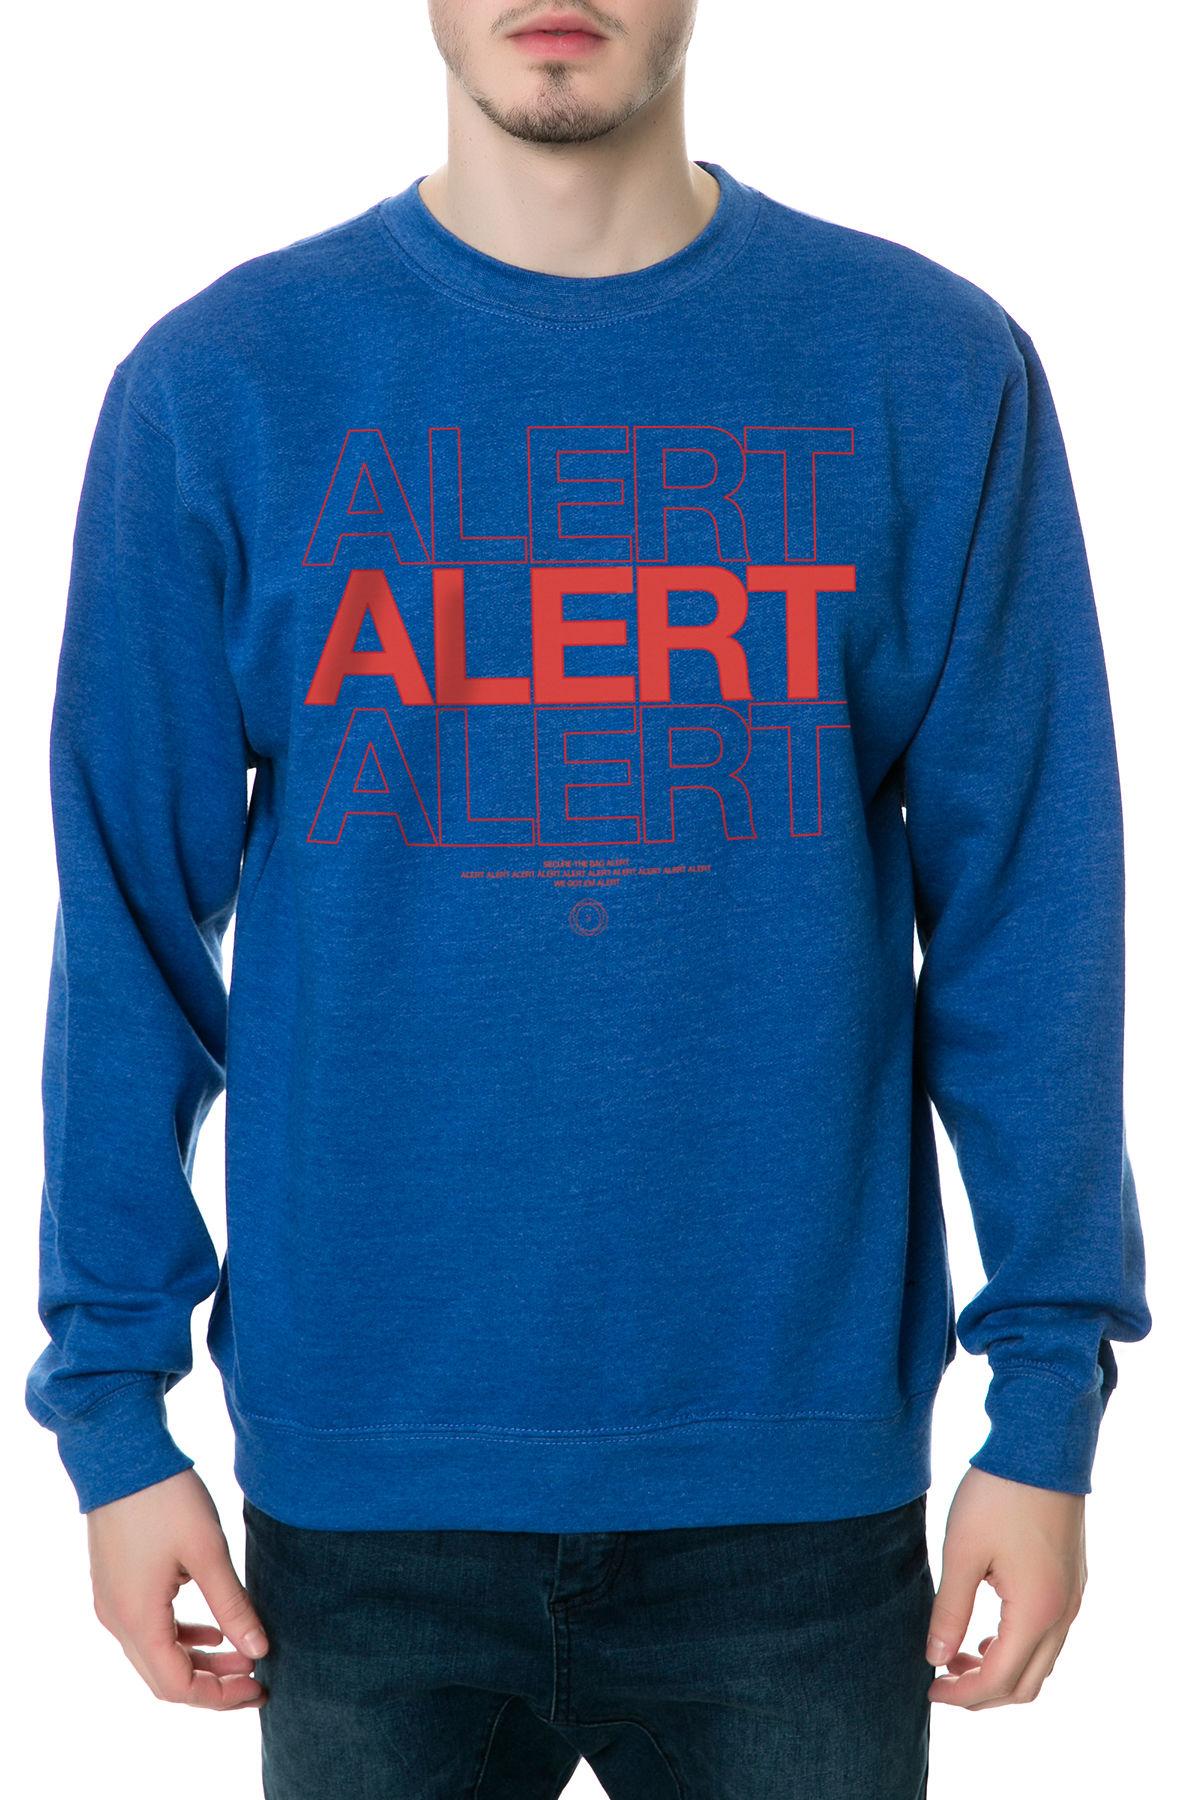 The Alert Crewneck Sweatshirt in Royal Blue